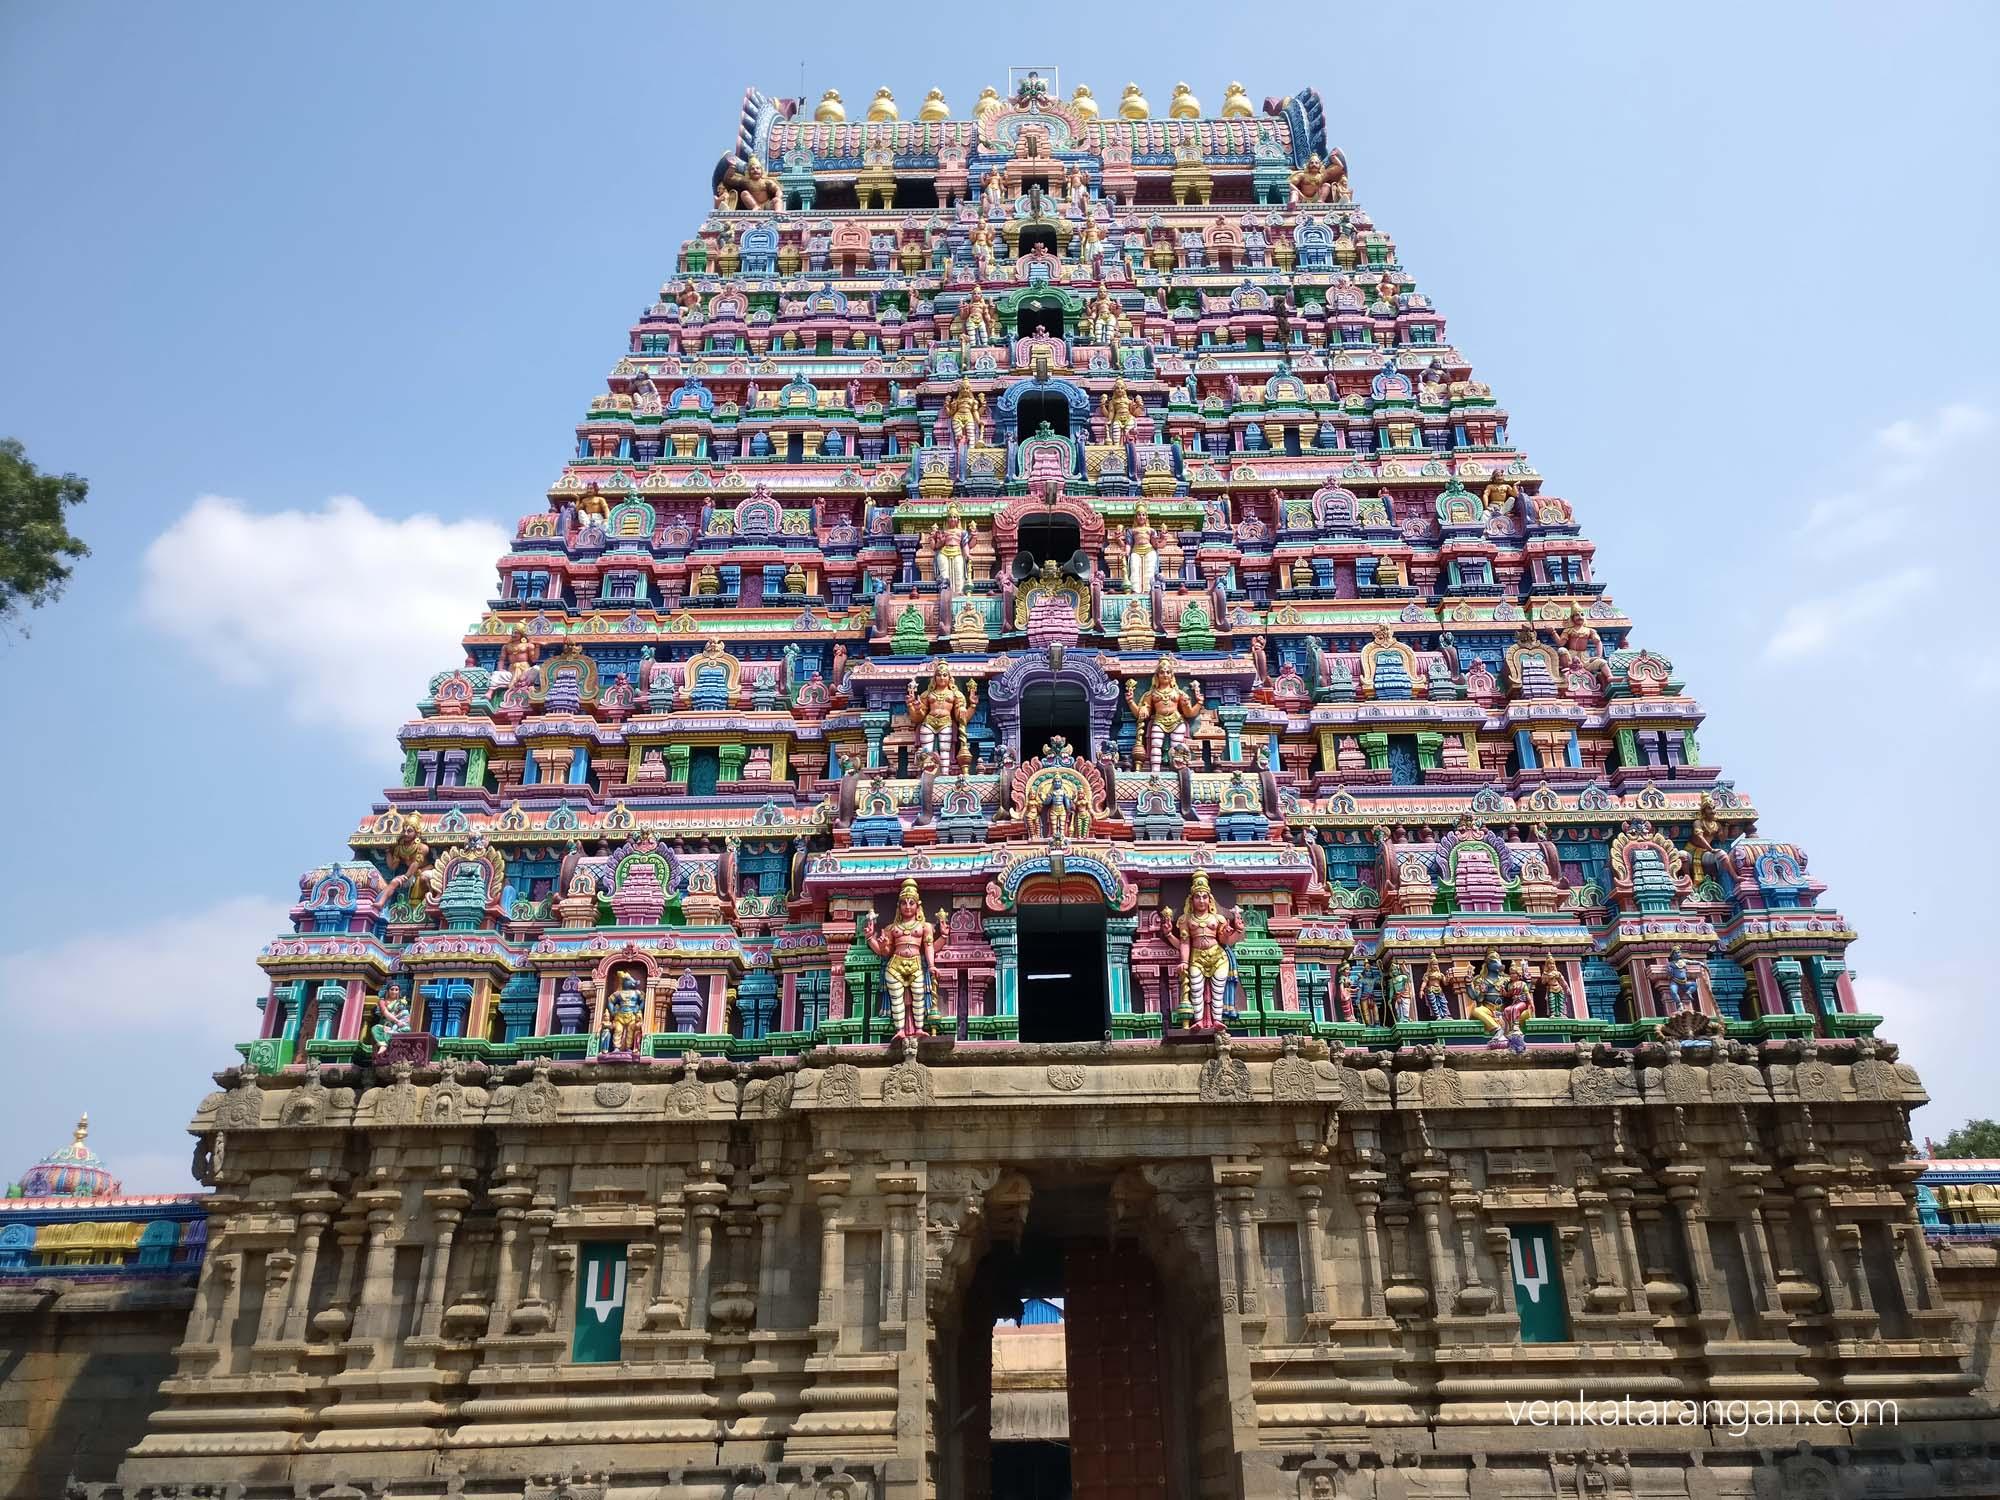 The front gopuram of Srimushnam temple